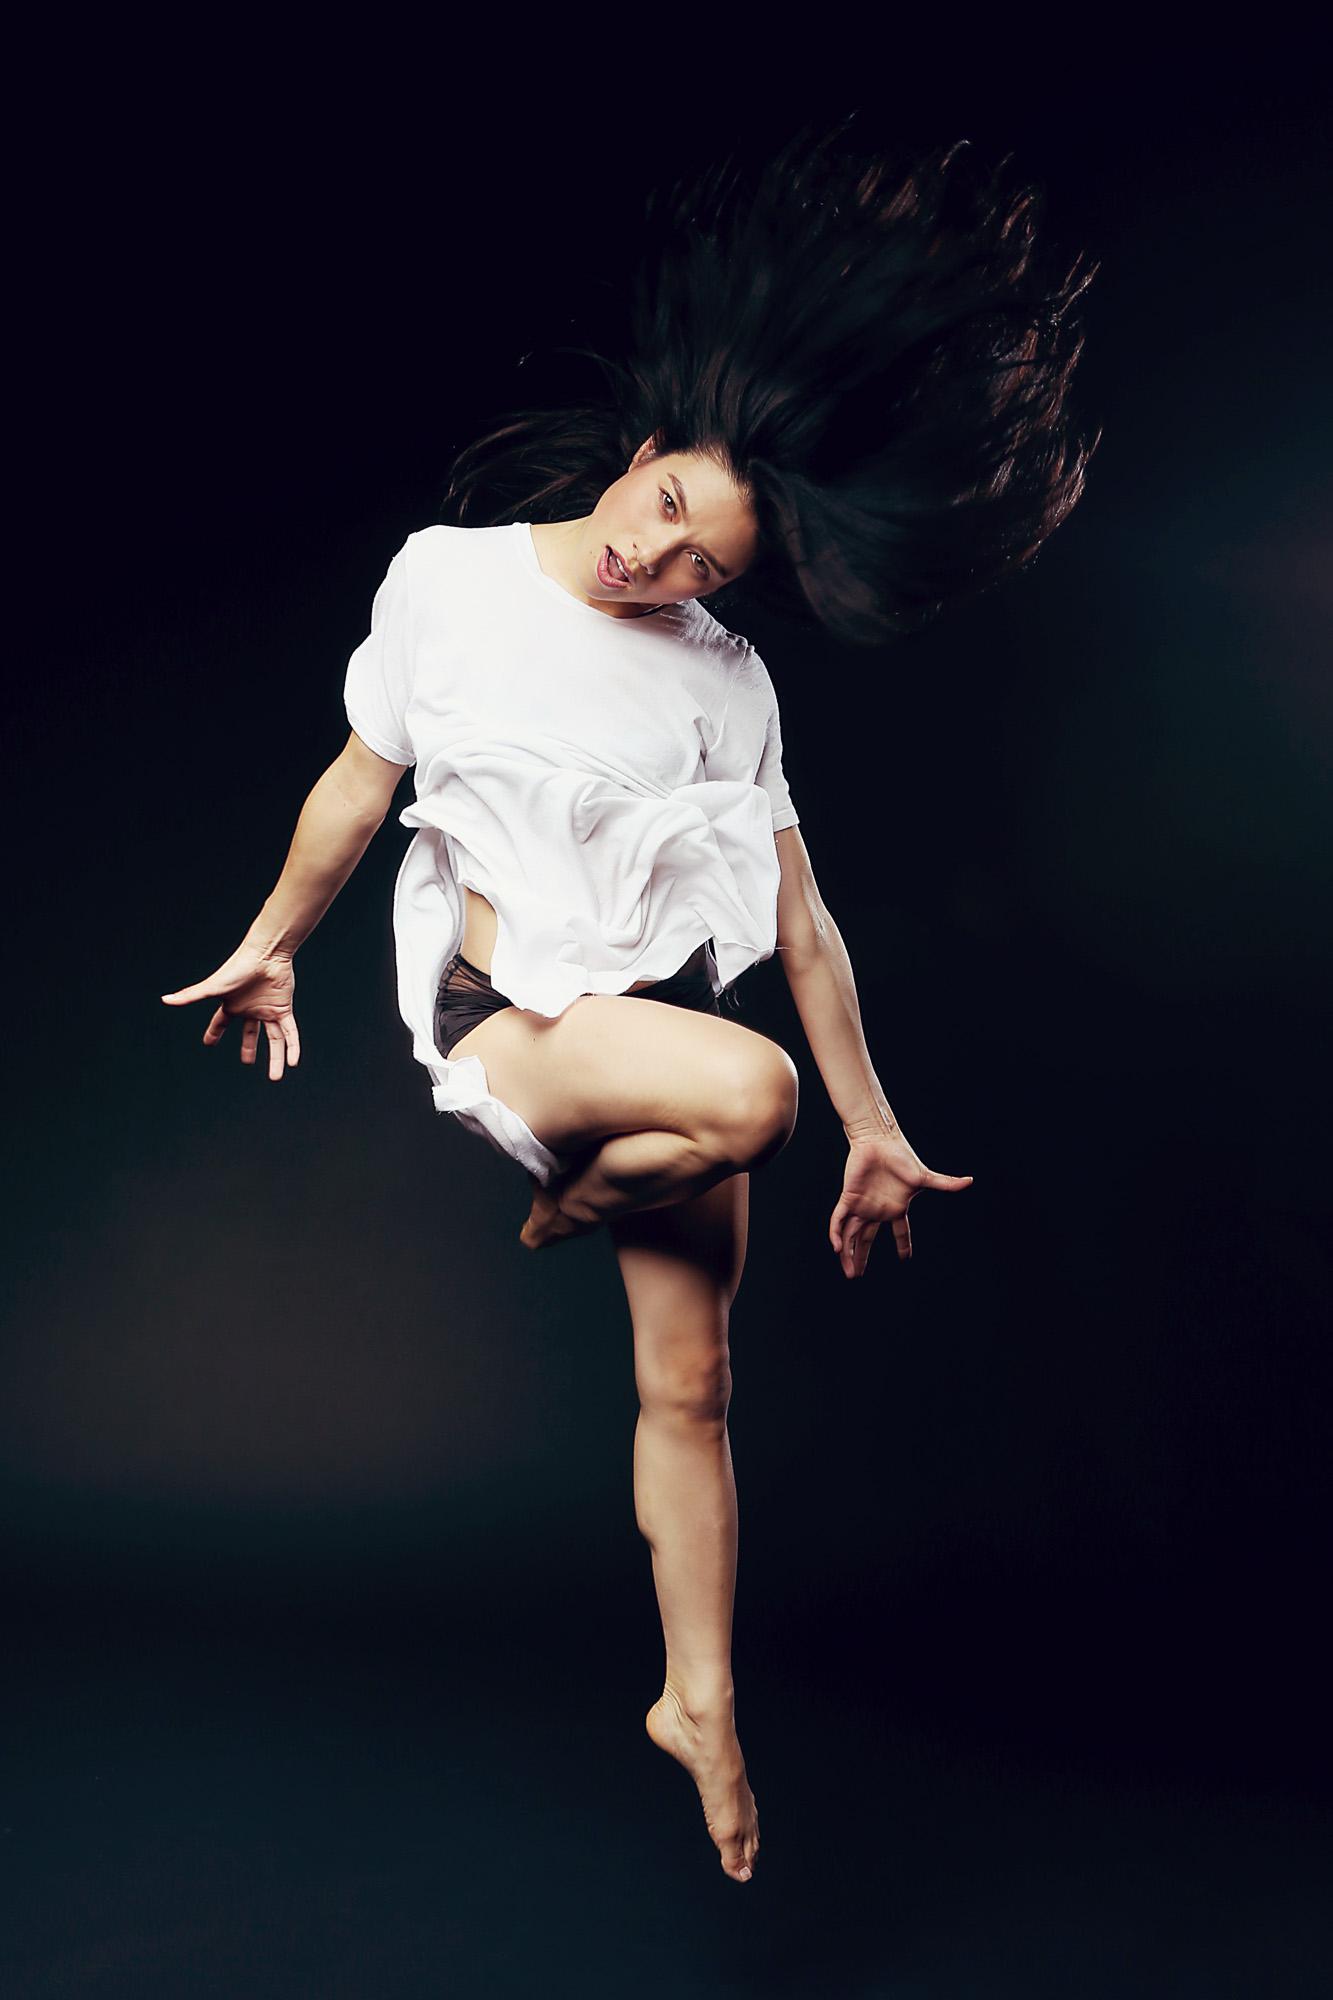 CURTISBROWNPHOTOGRAPHY_DANCE_054.JPG